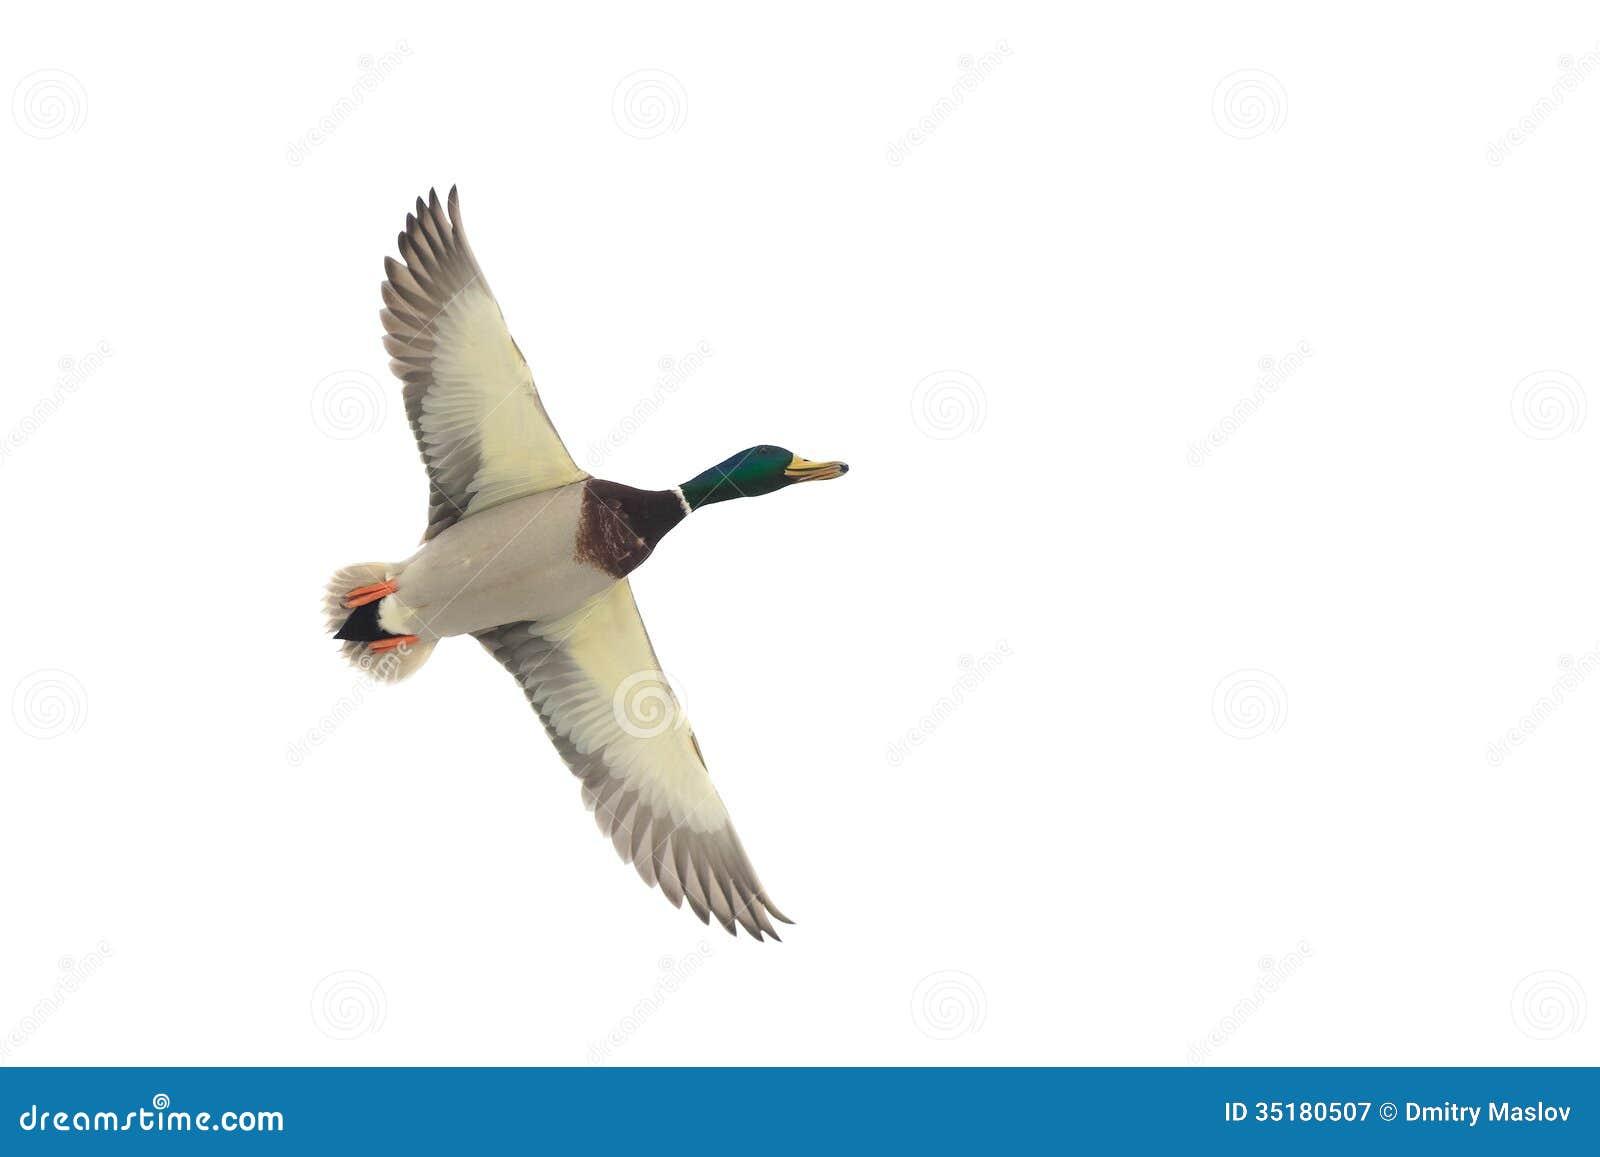 A Flying Mallard Duck Stock Photo 35180507 Megapixl